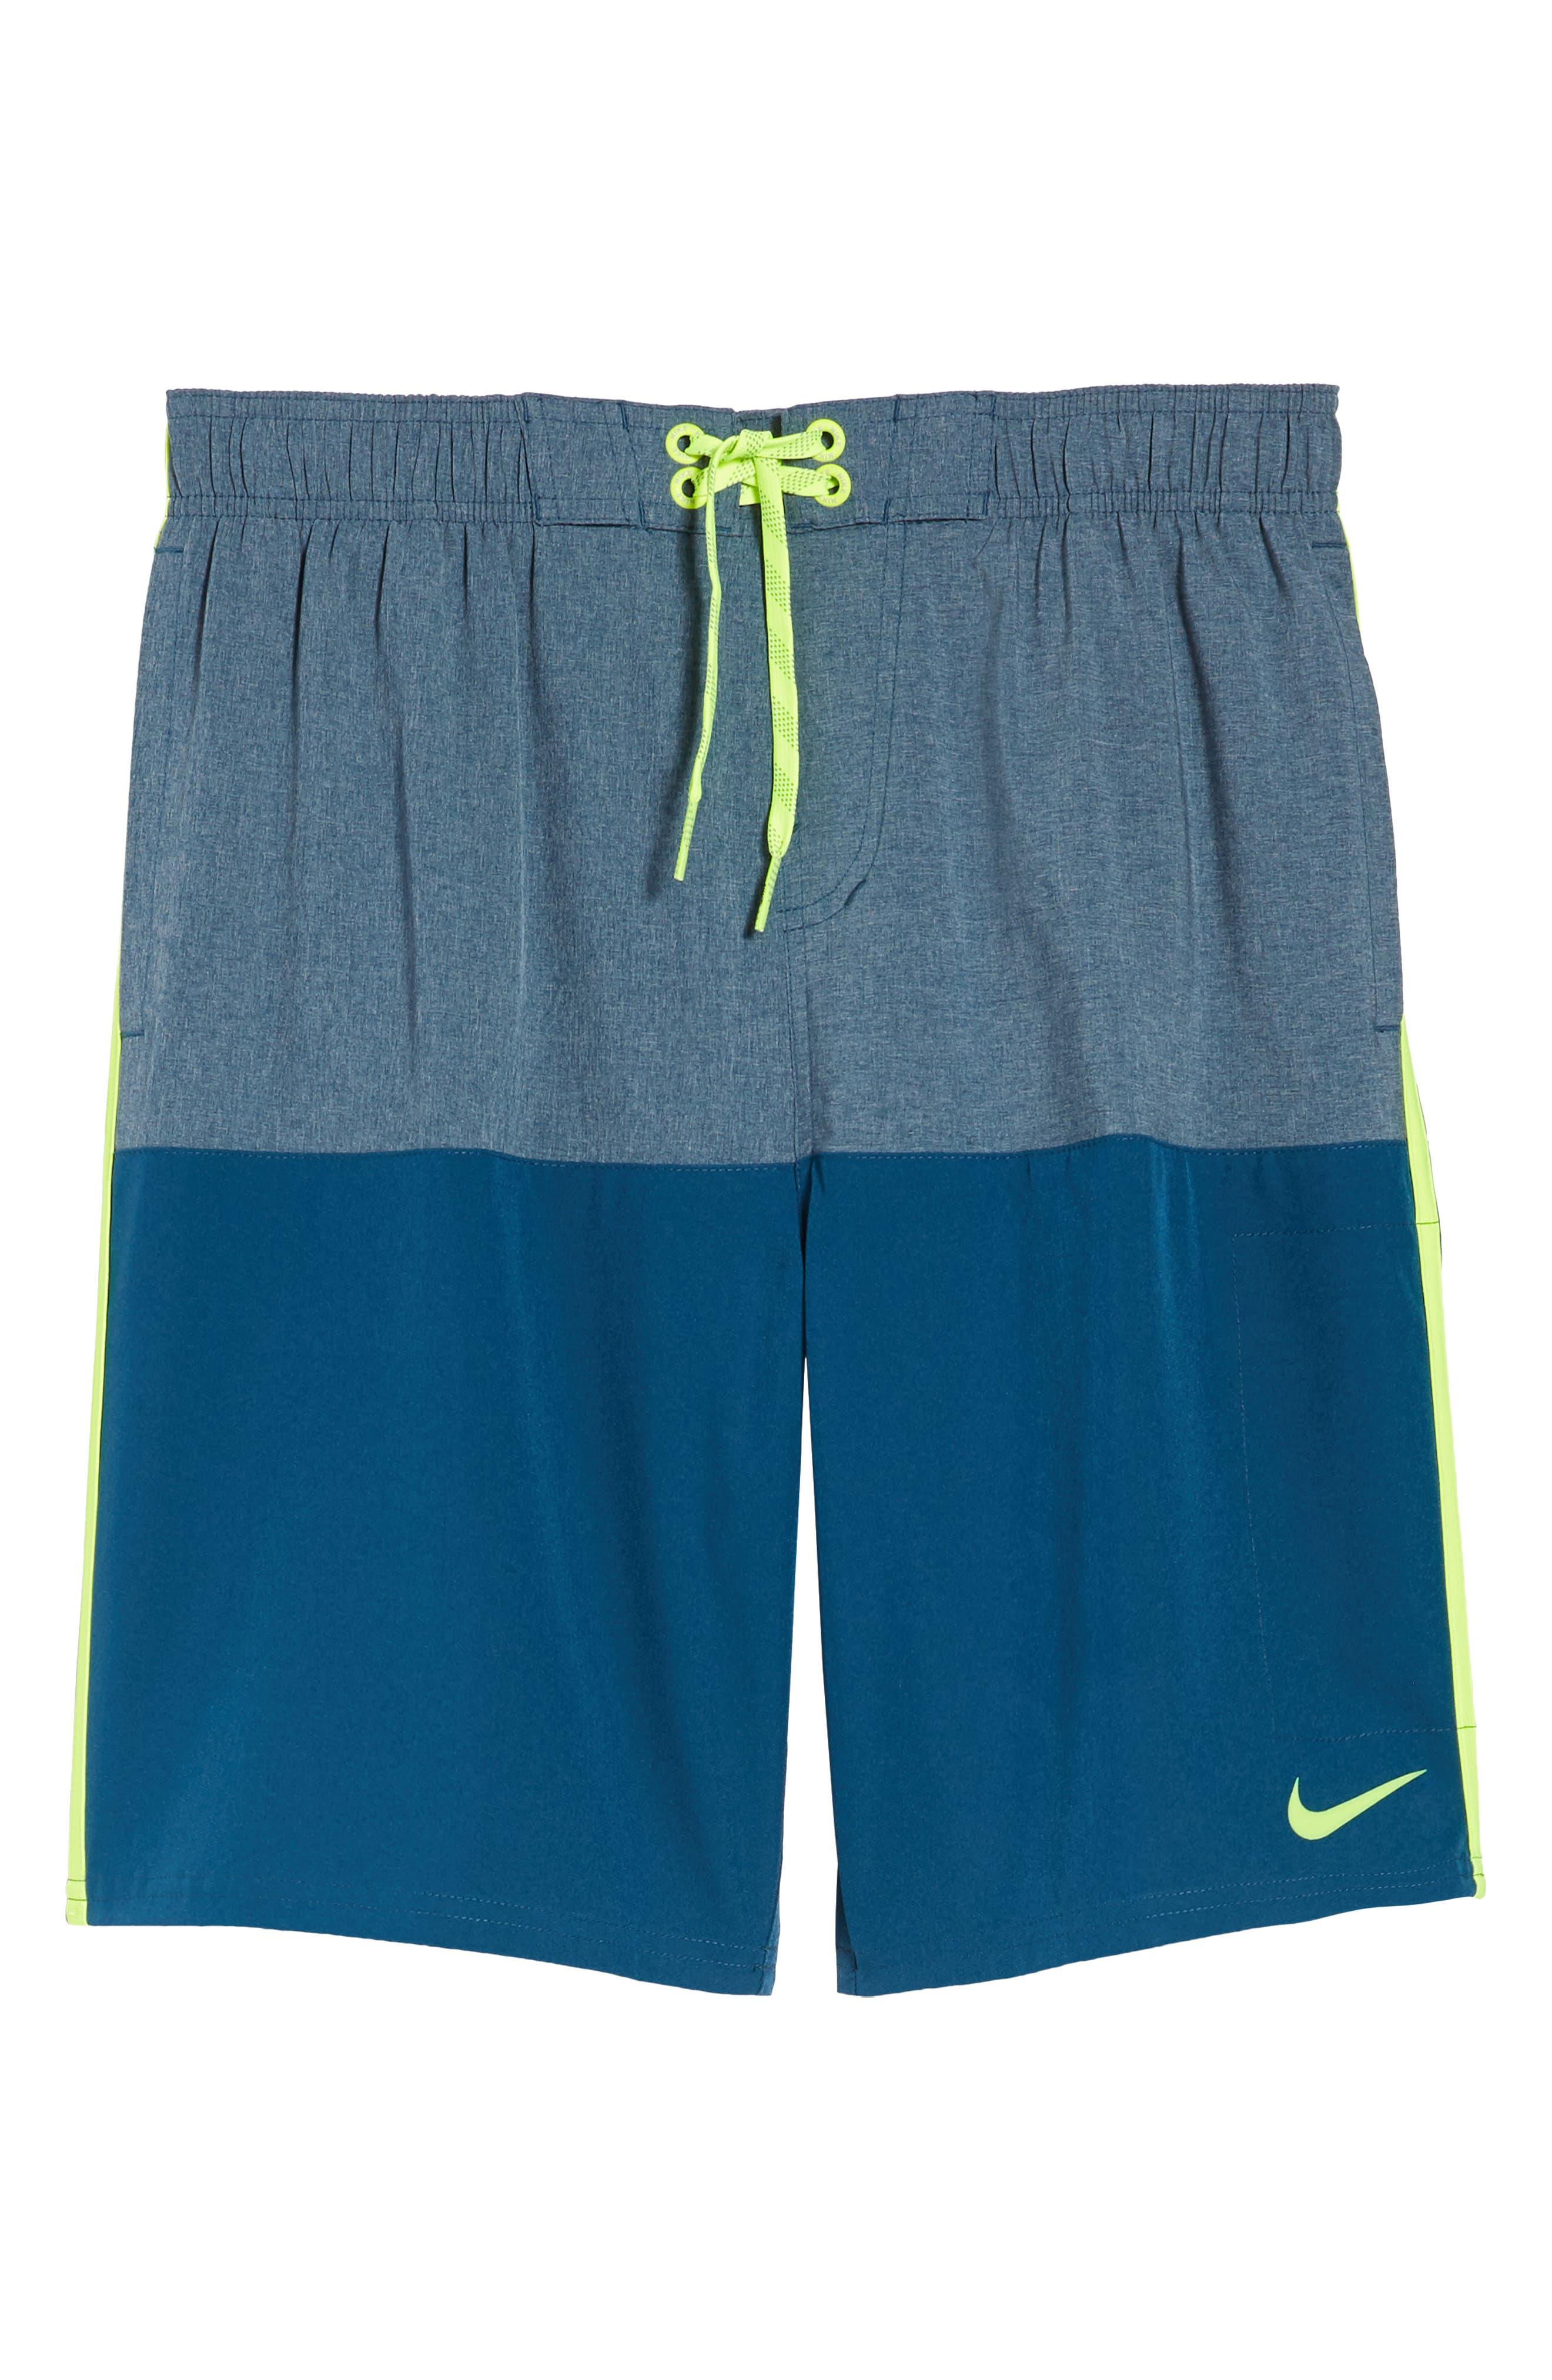 Split Board Shorts,                             Alternate thumbnail 6, color,                             Blue Force